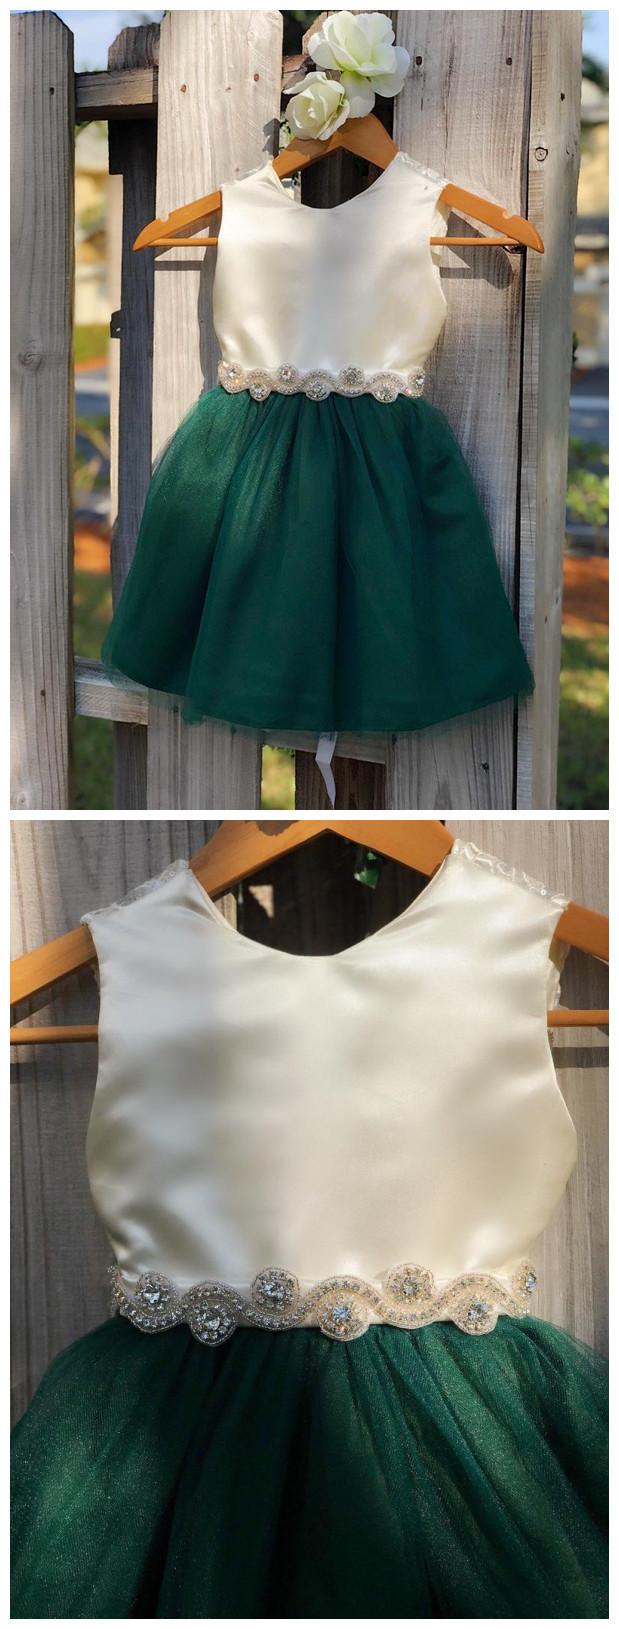 Hunter Green Flower Girl Dresses with Rhinestone Sash. Elegant Ivory Satin and